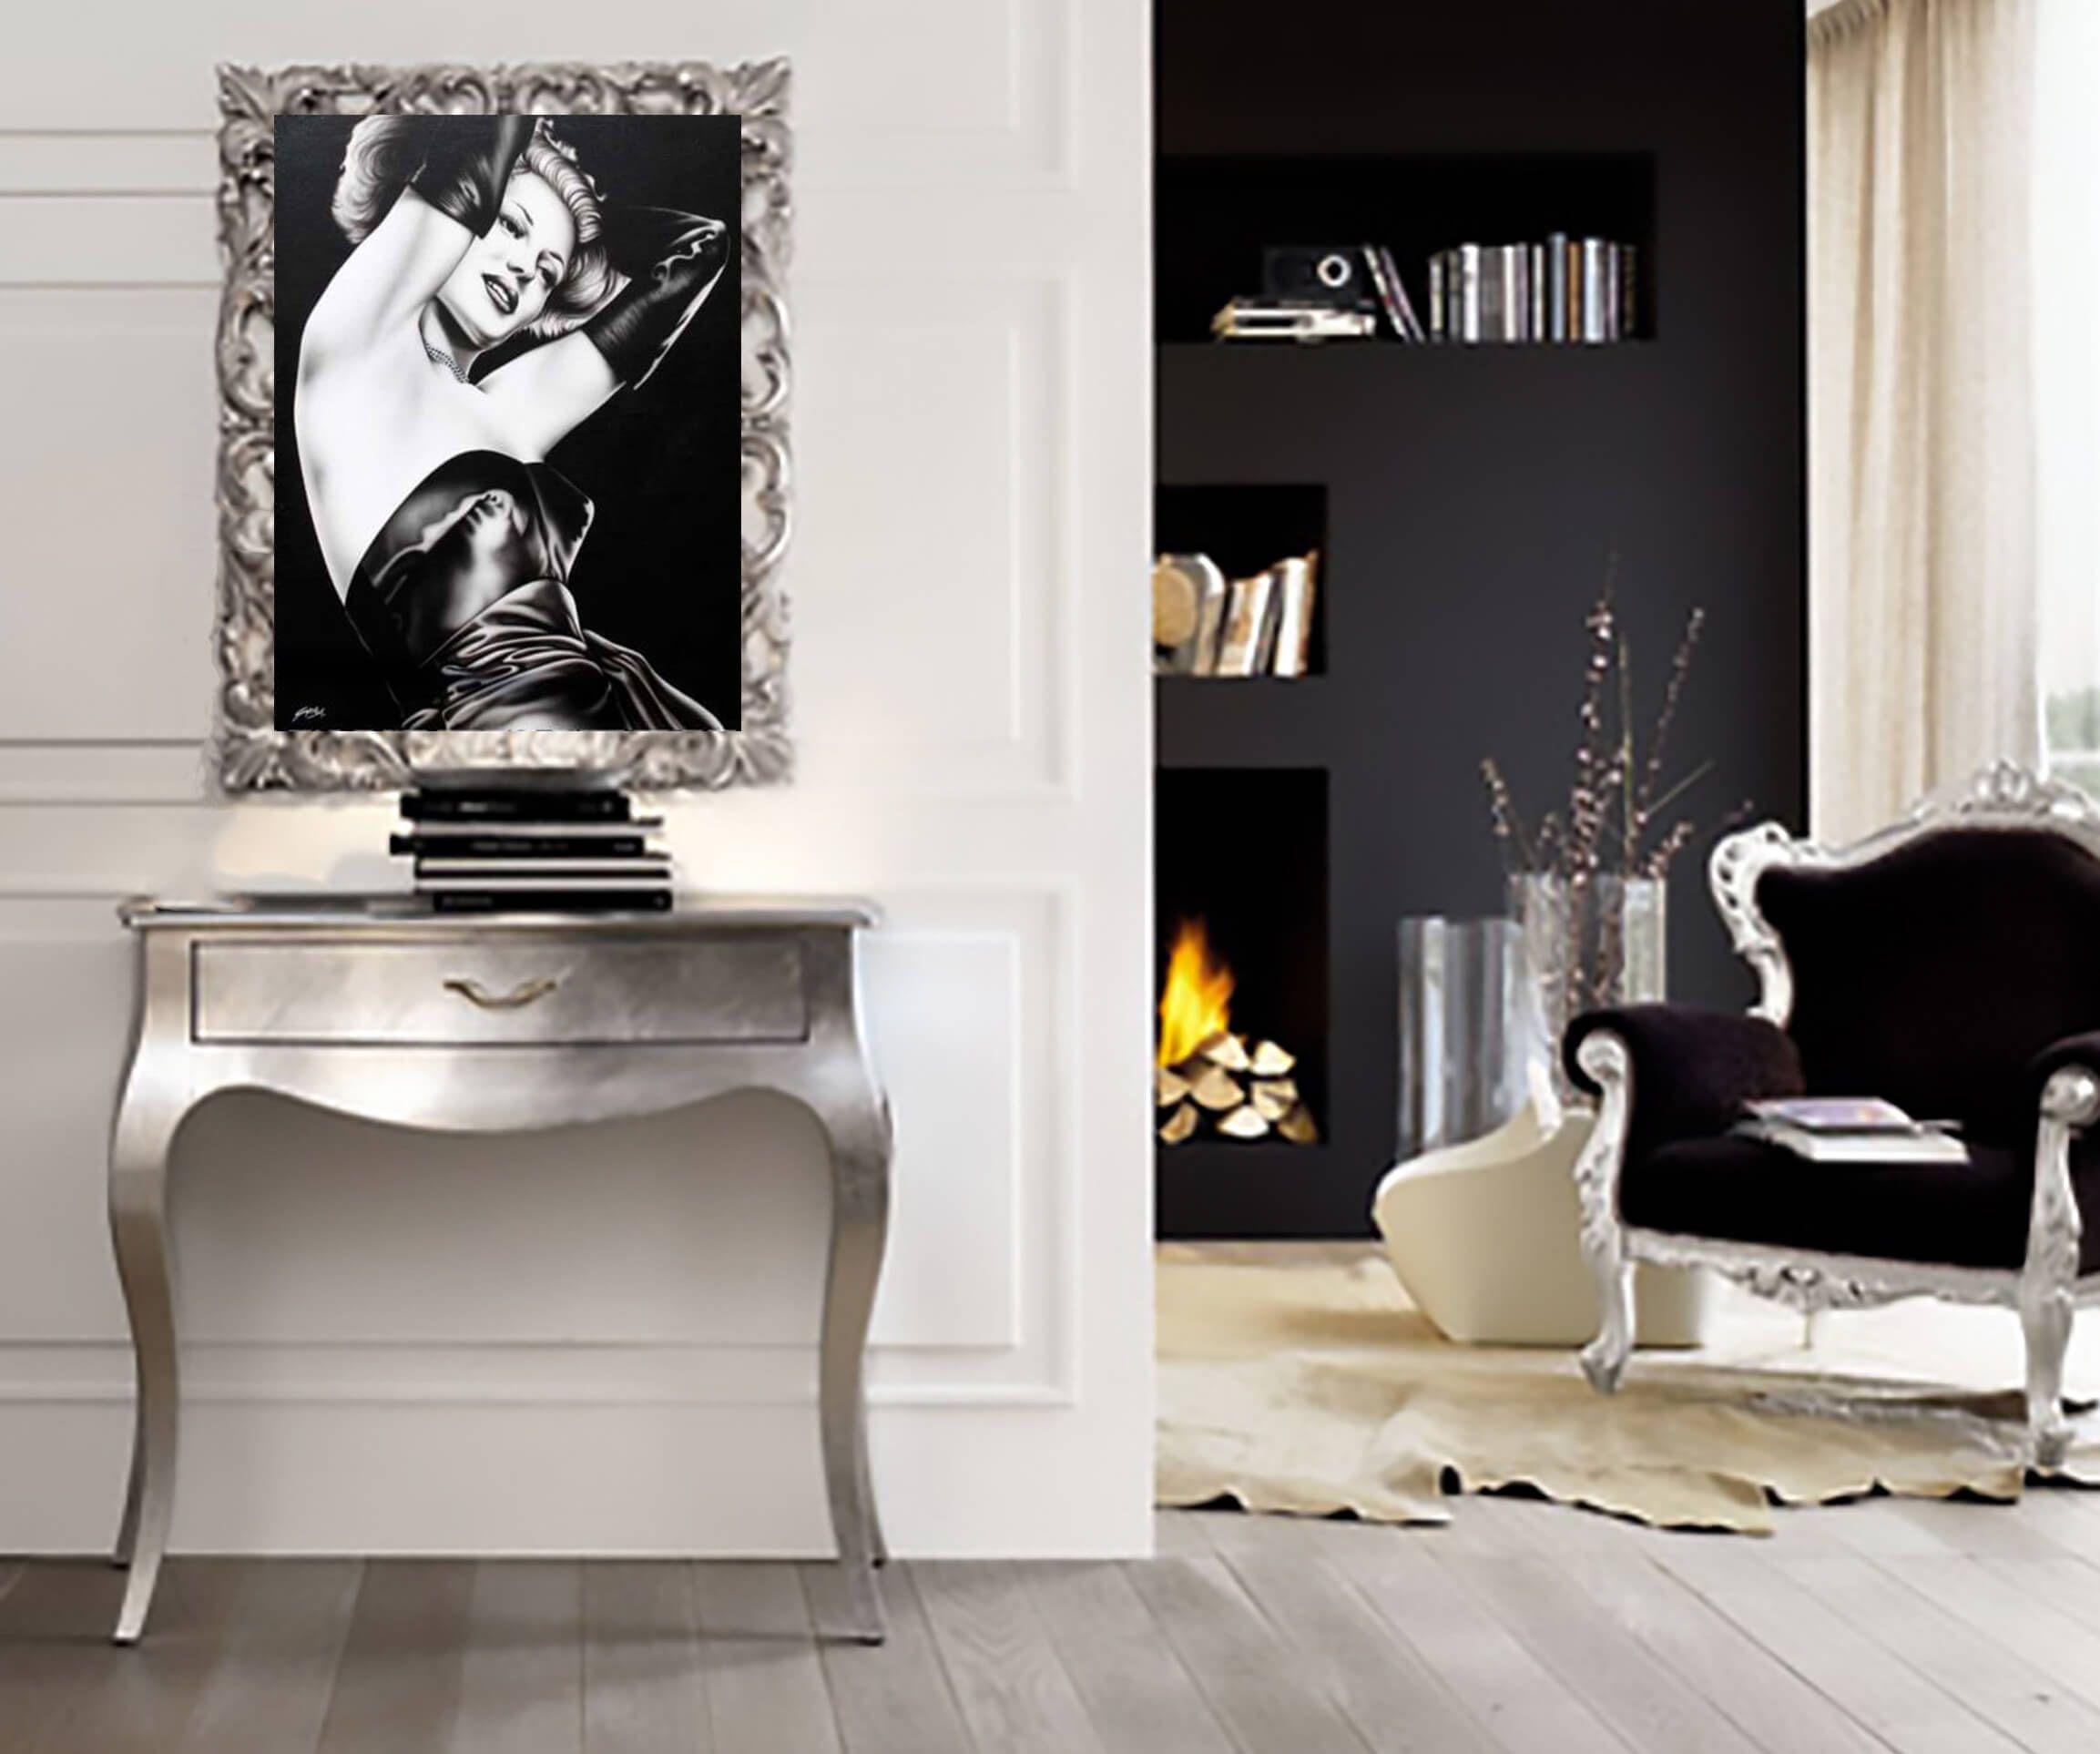 Emejing quadri moderni bianco e nero pictures for Quadri in bianco e nero moderni